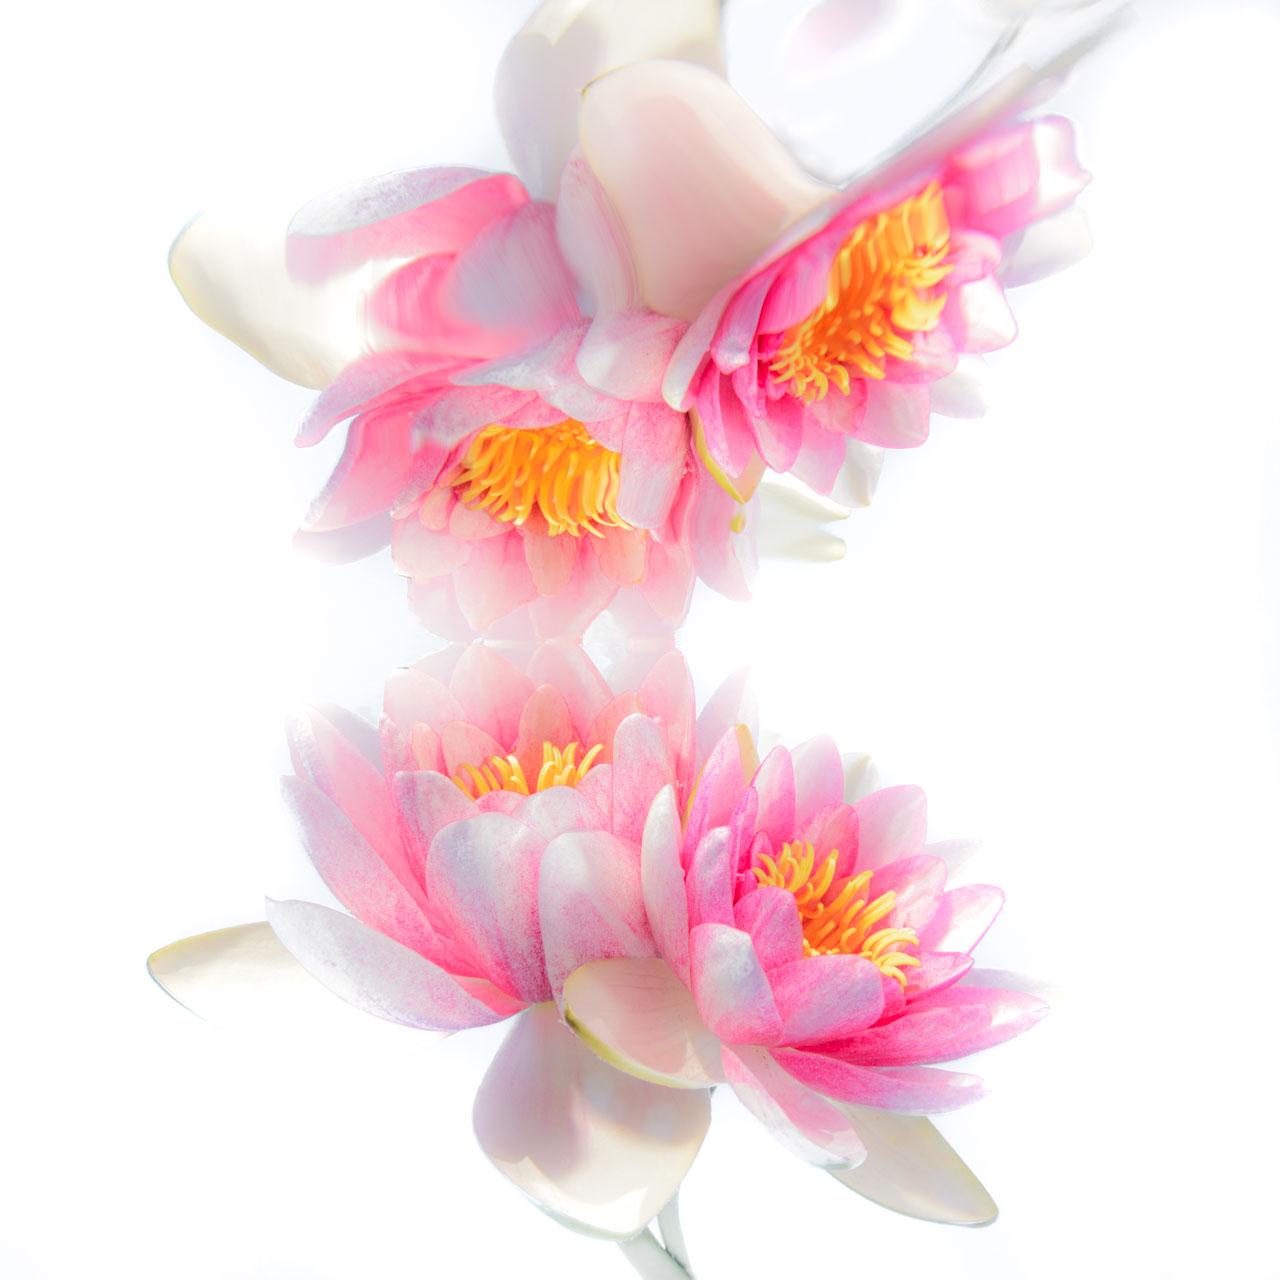 Fine art image of Pink Waterlilies underwater.